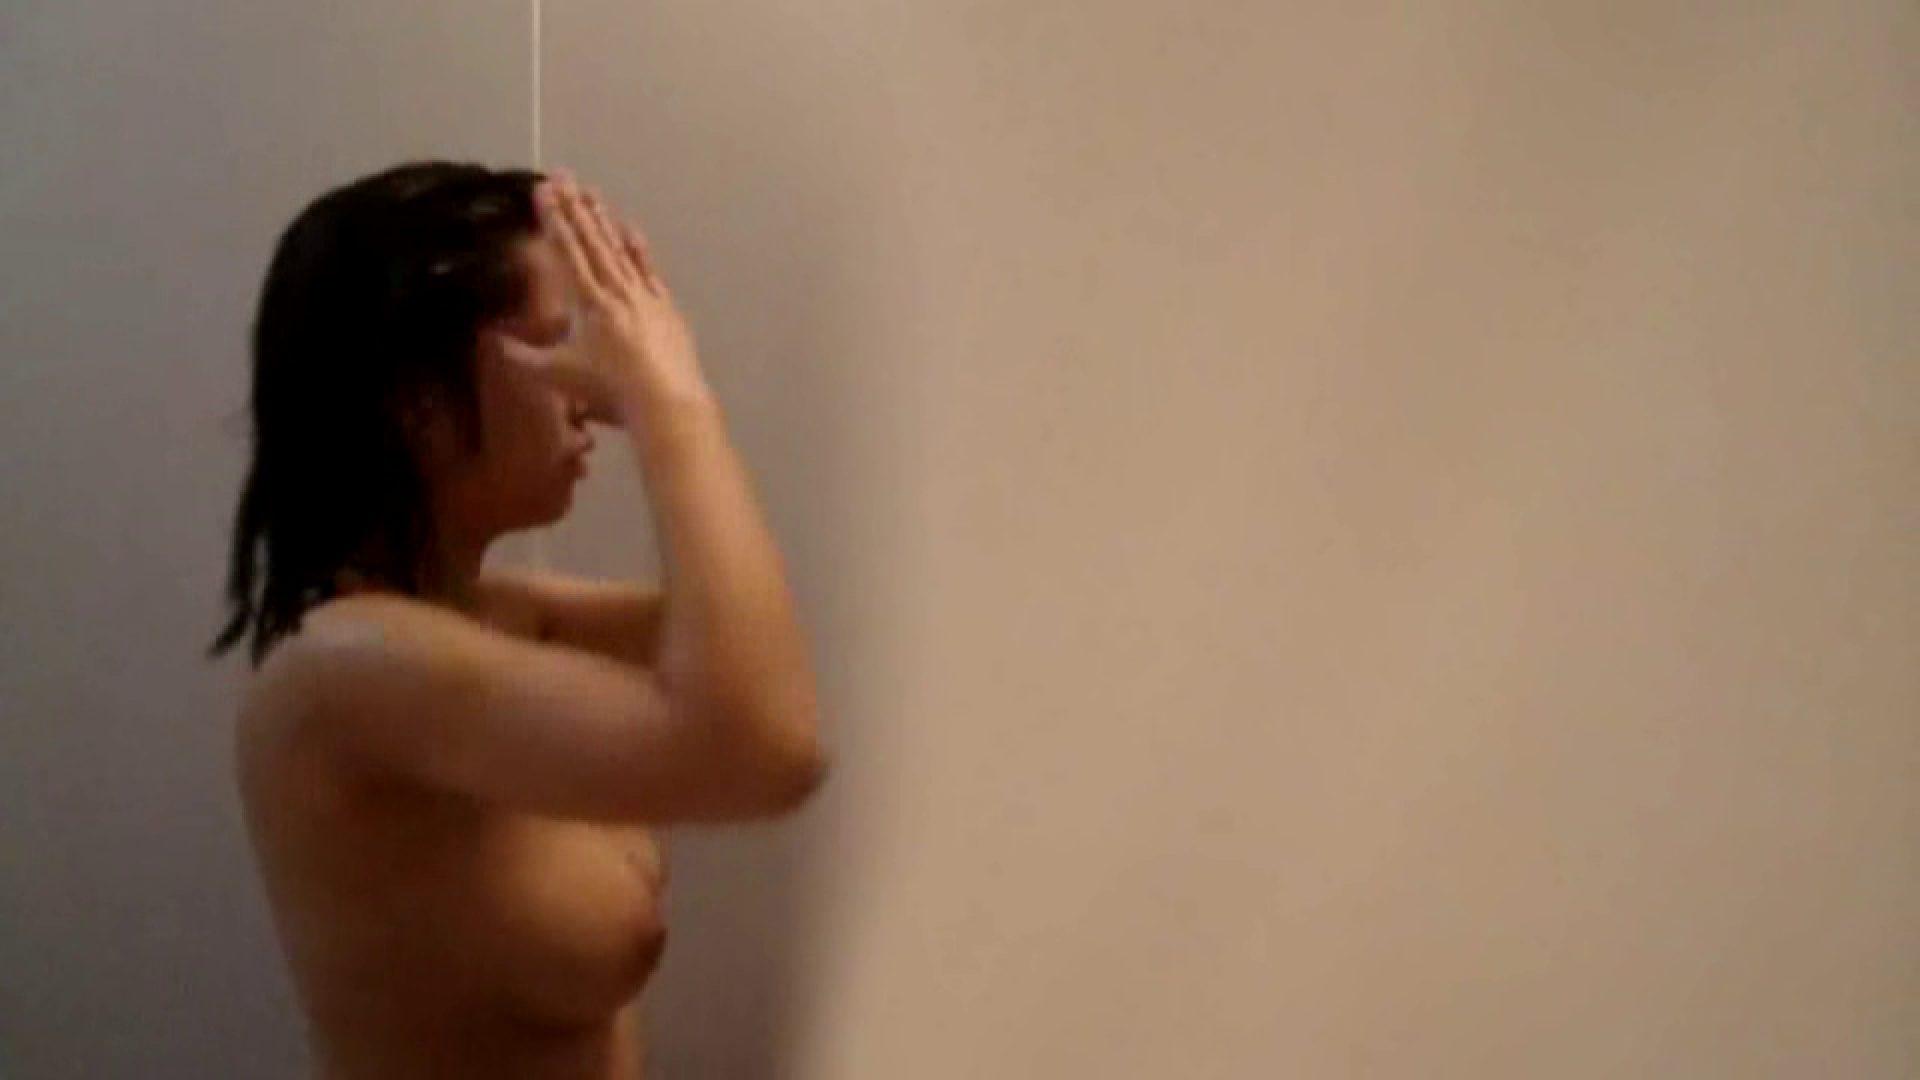 vol.2 葵のグラドル顔負けの爆乳を入浴シーンでどうぞ。 爆乳 すけべAV動画紹介 64PIX 43